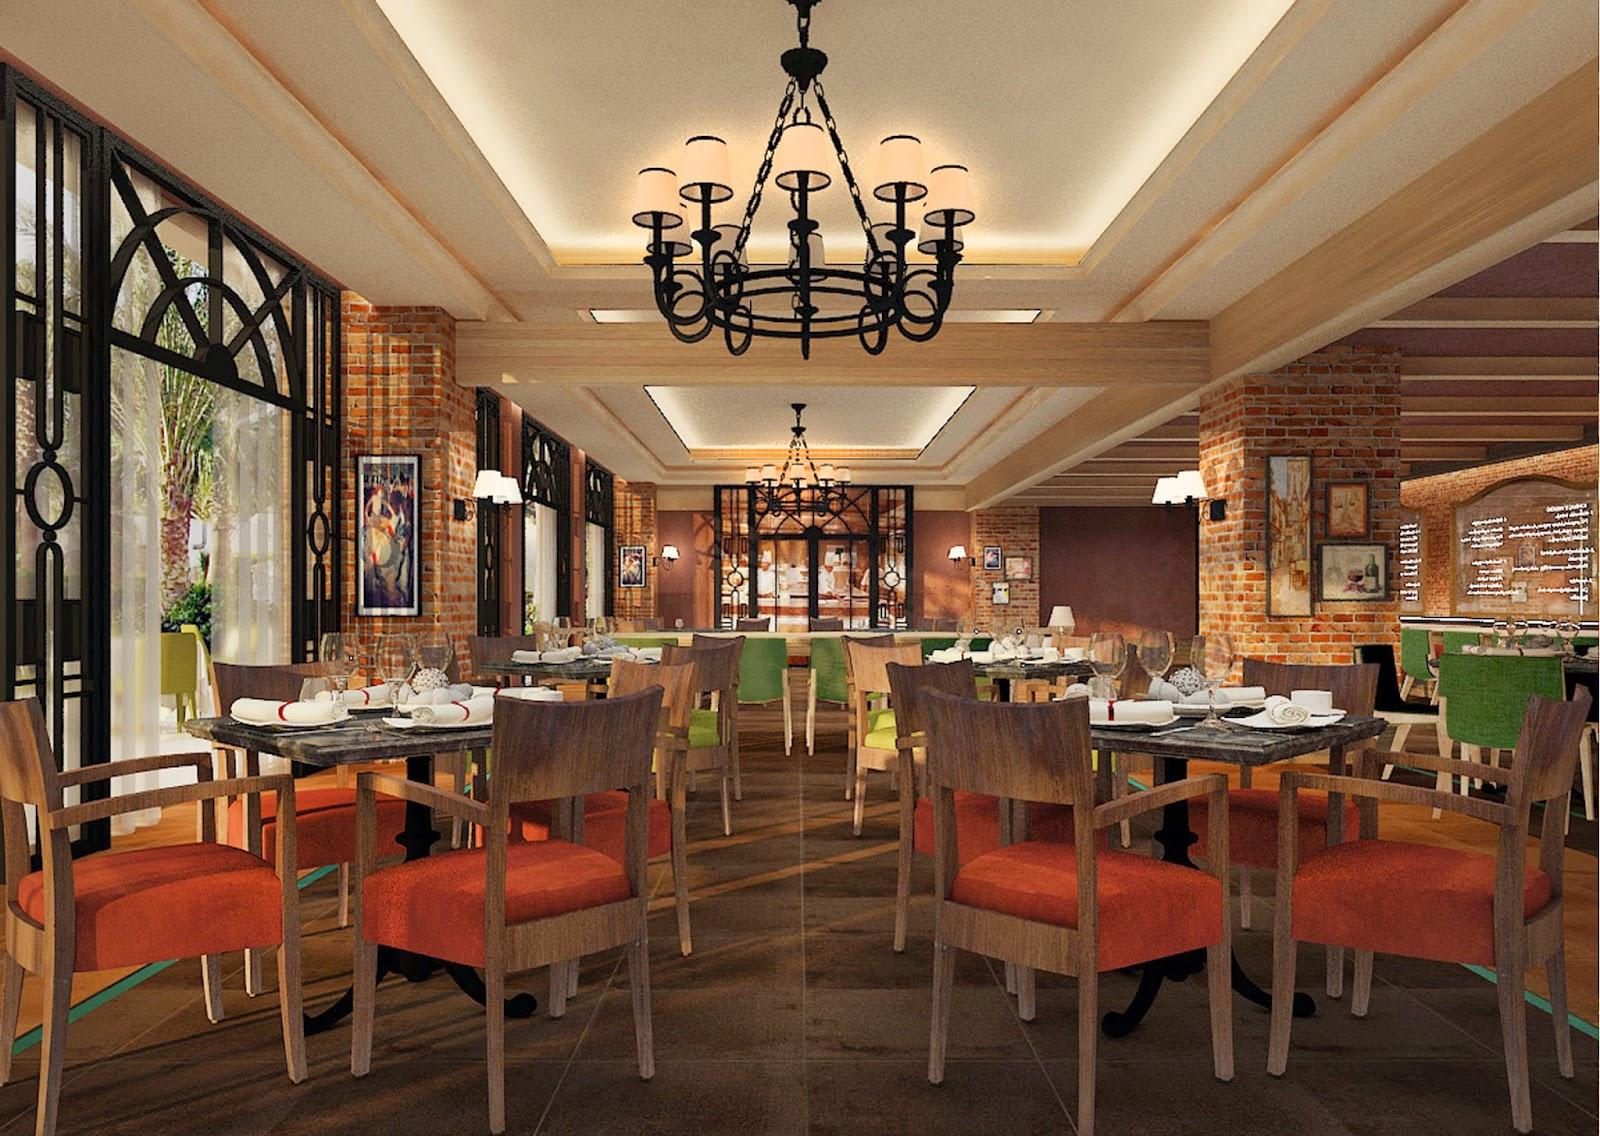 Loliva Restoran,L'oliva,Elite World Business Hotel, yeni mekan, mekan bloggeri, pinar dumlupinar, italyan mutfagi